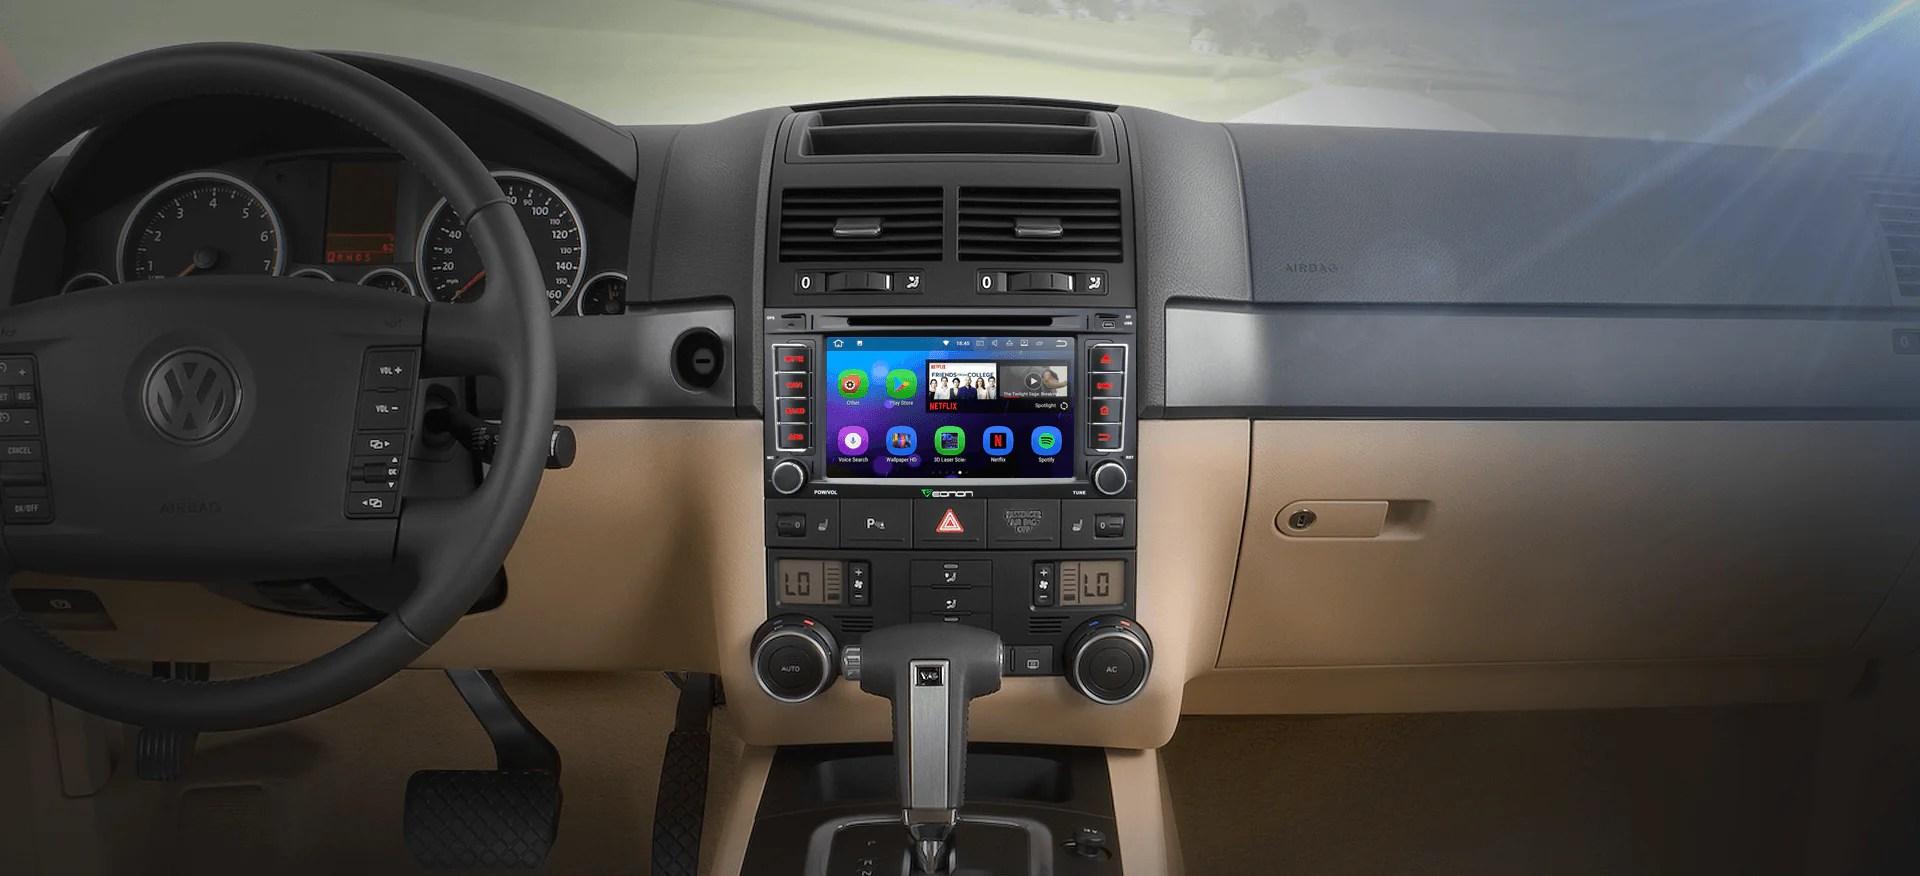 medium resolution of volkswagen vw touareg transporter 7 digital touch screen android ios multimedia car dvd gps